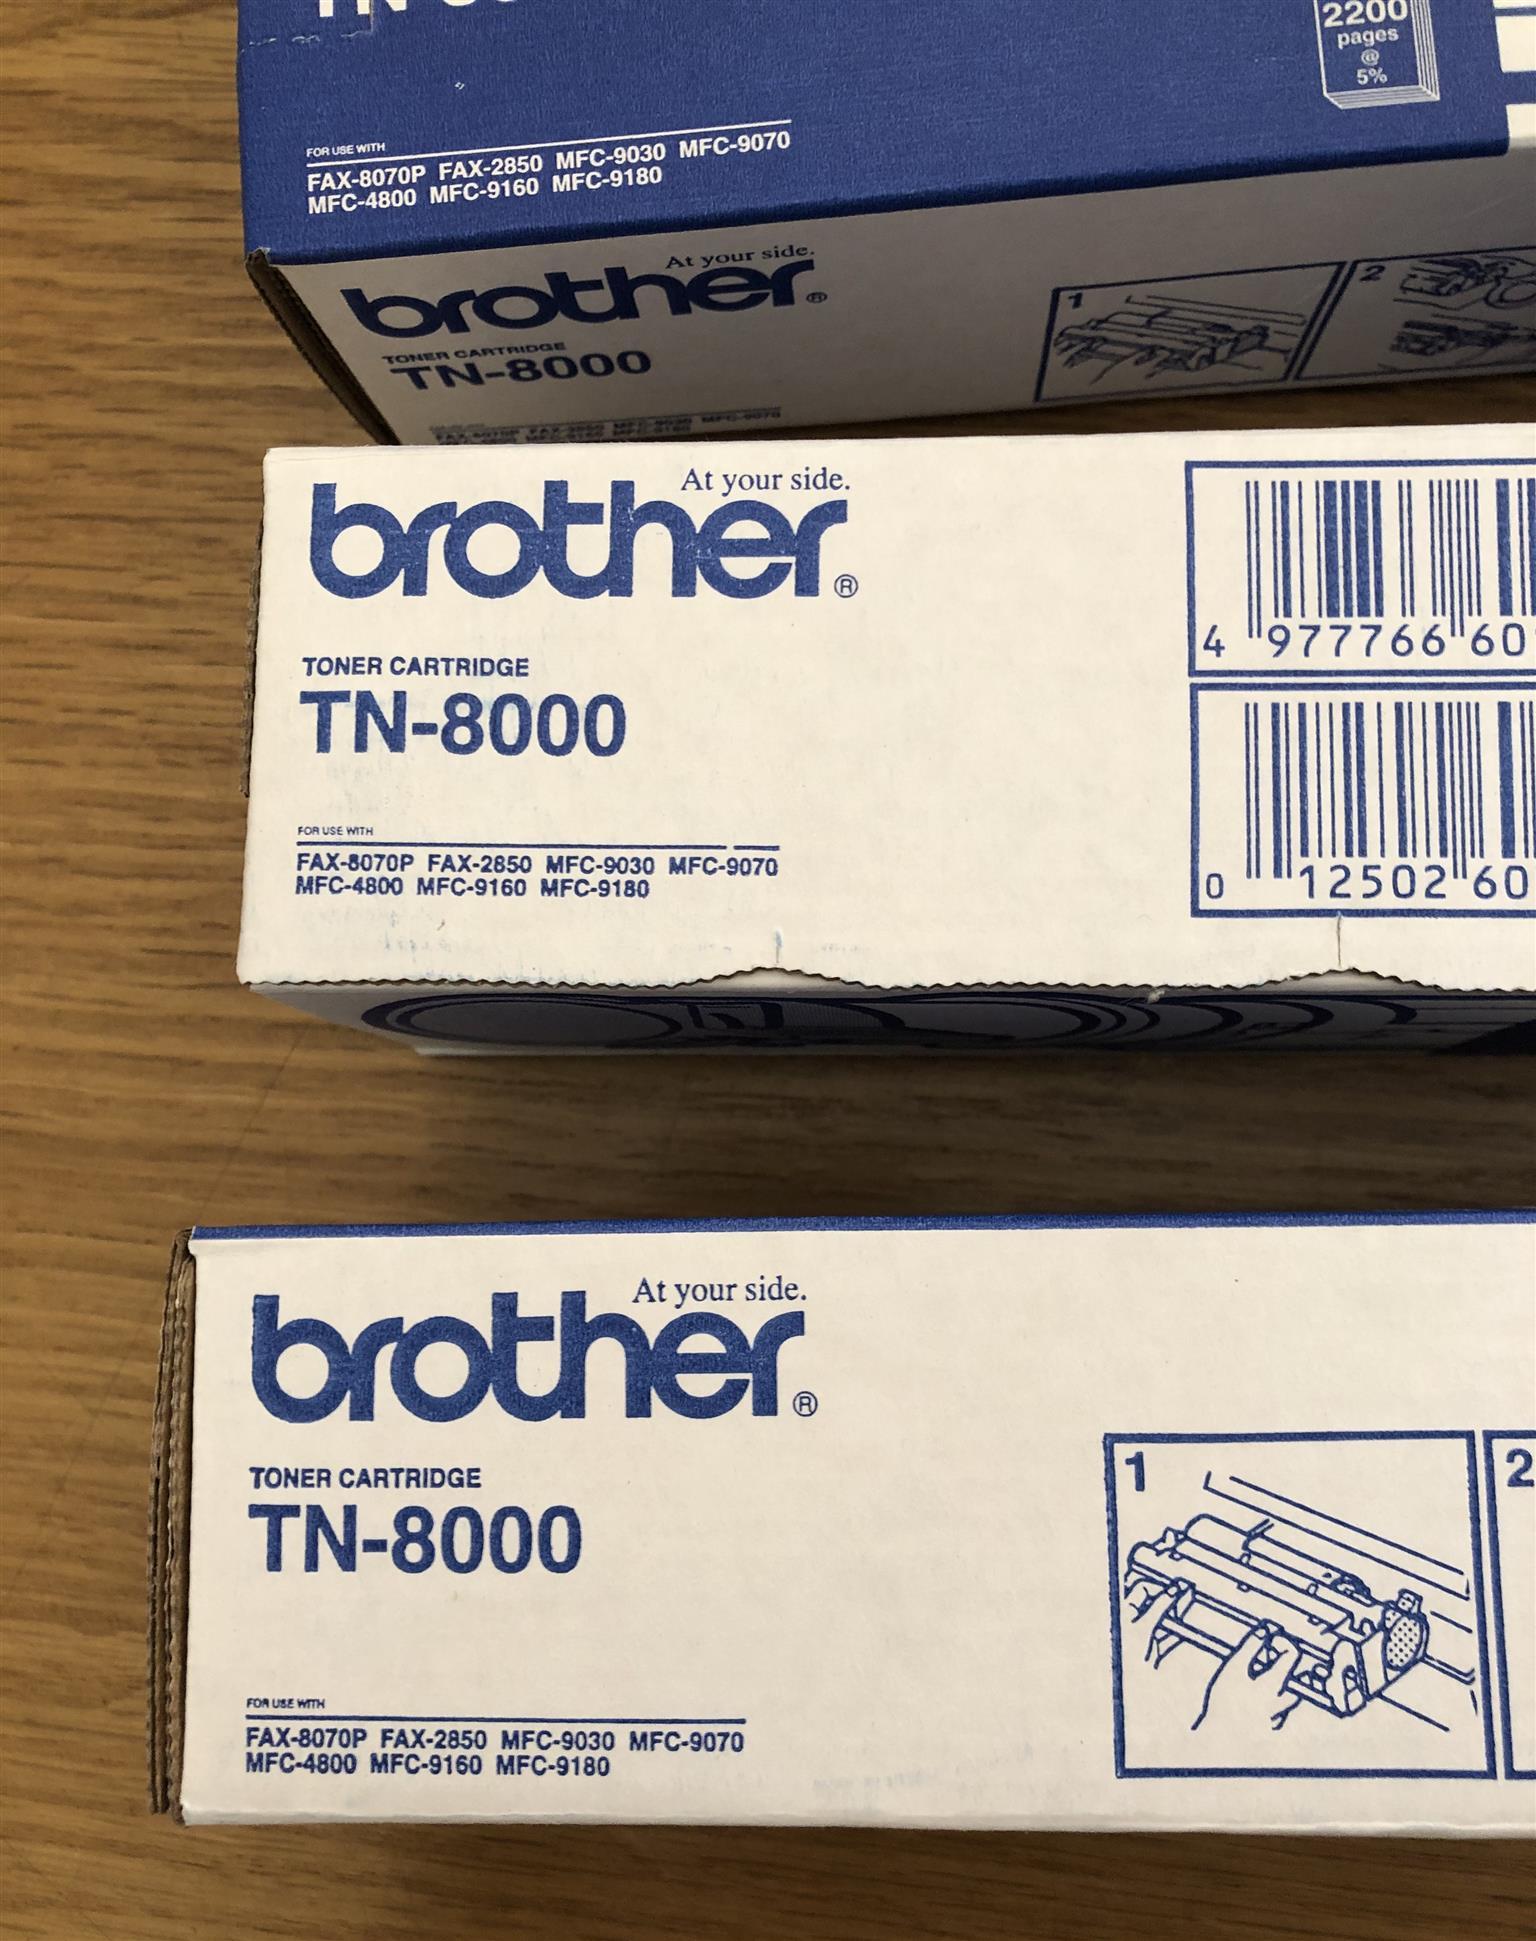 Brother TN-8000 Toner Cartridge for Laser Printer